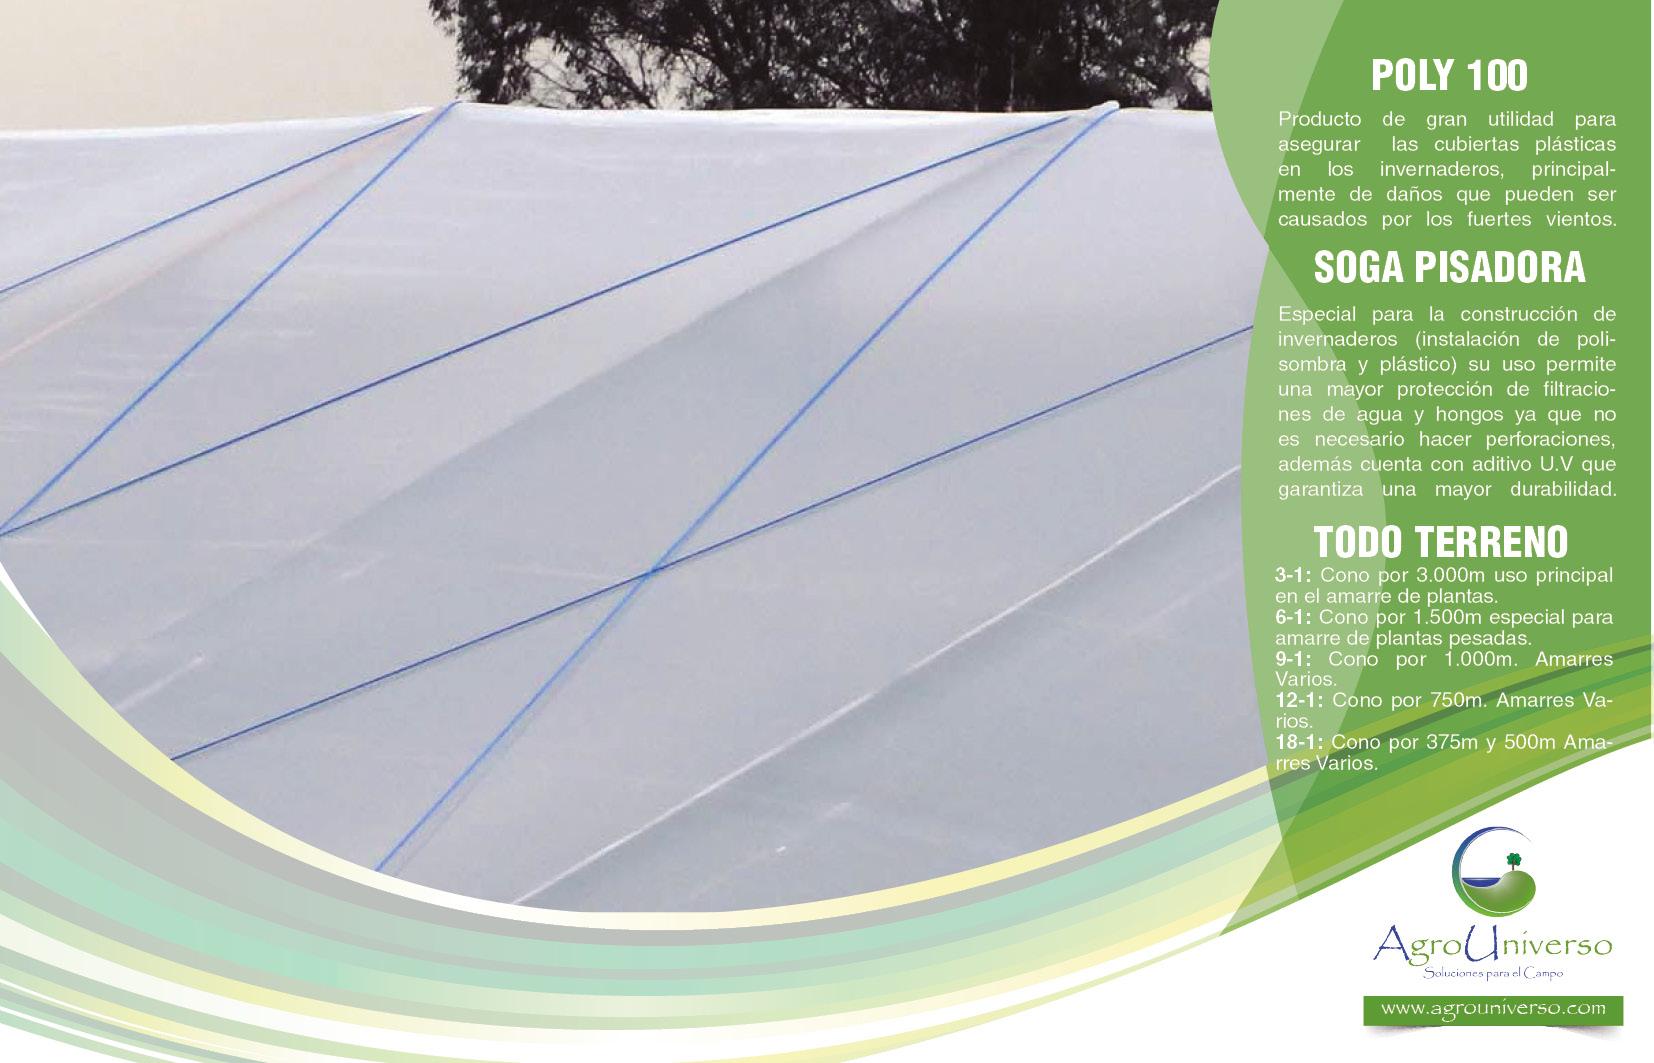 Catlogo-de-productos-Agrouniverso-20